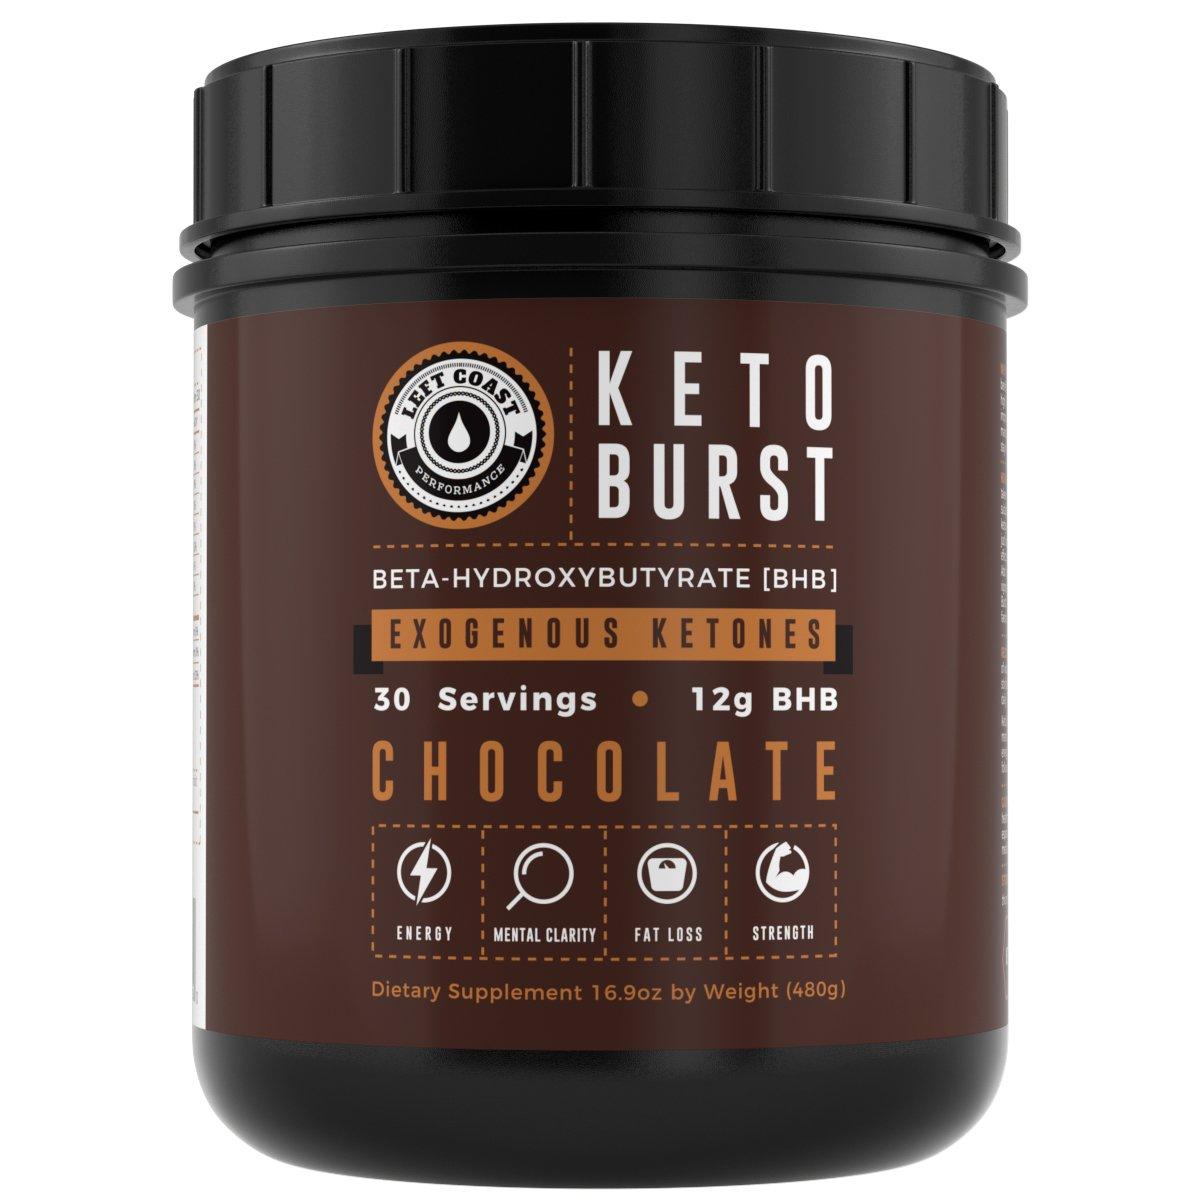 Keto Burst - Beta Hydroxybutyrate (BHB) Salt Ketone Supplement - Double Size 17 Oz (30 Servings) Chocolate - Exogenous Ketones Powder - Ca, Na & Magnesium BHB Salts. Left Coast Performance (1.06 lbs)